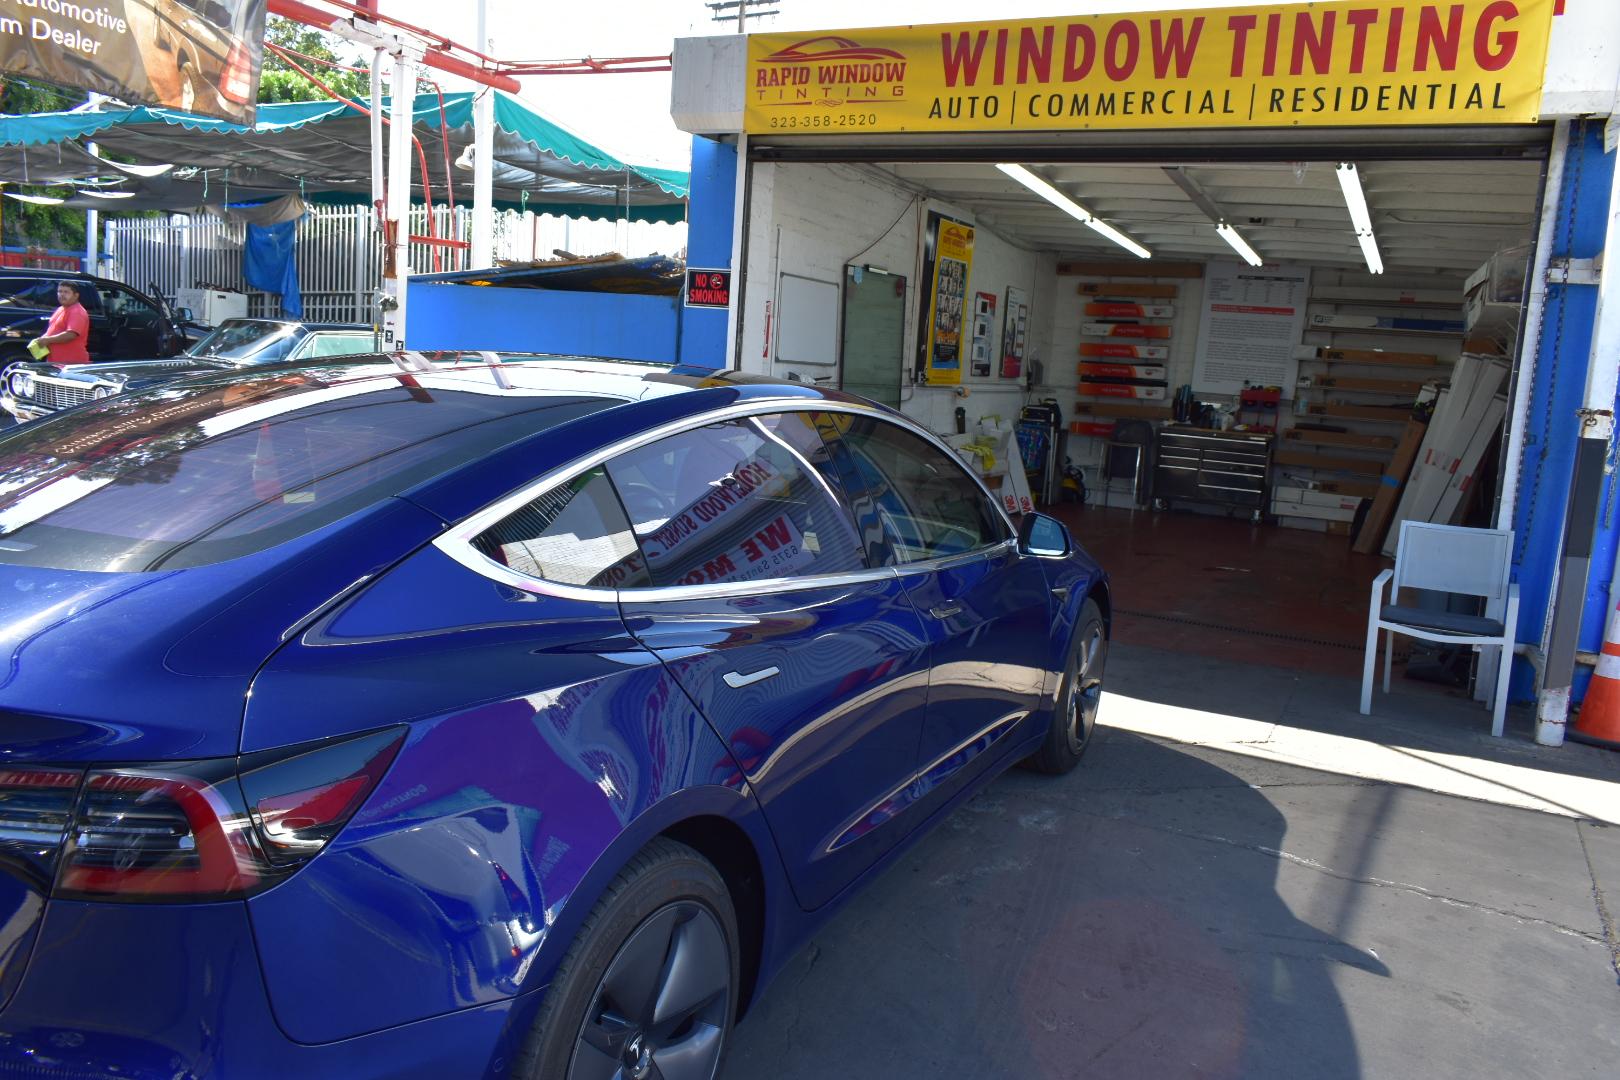 3M window film, 3m crystalline window tint, llumar window tint, car window tint, best window tint, commercial window film, privacy window film, best window tint shop los angeles